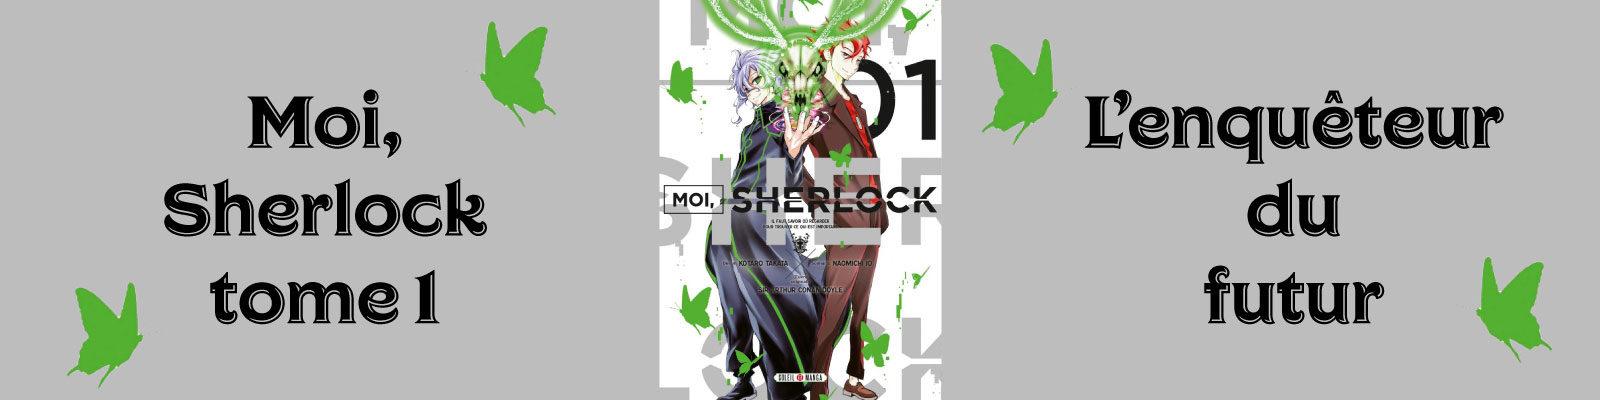 Moi,-Sherlock-Vol.-1